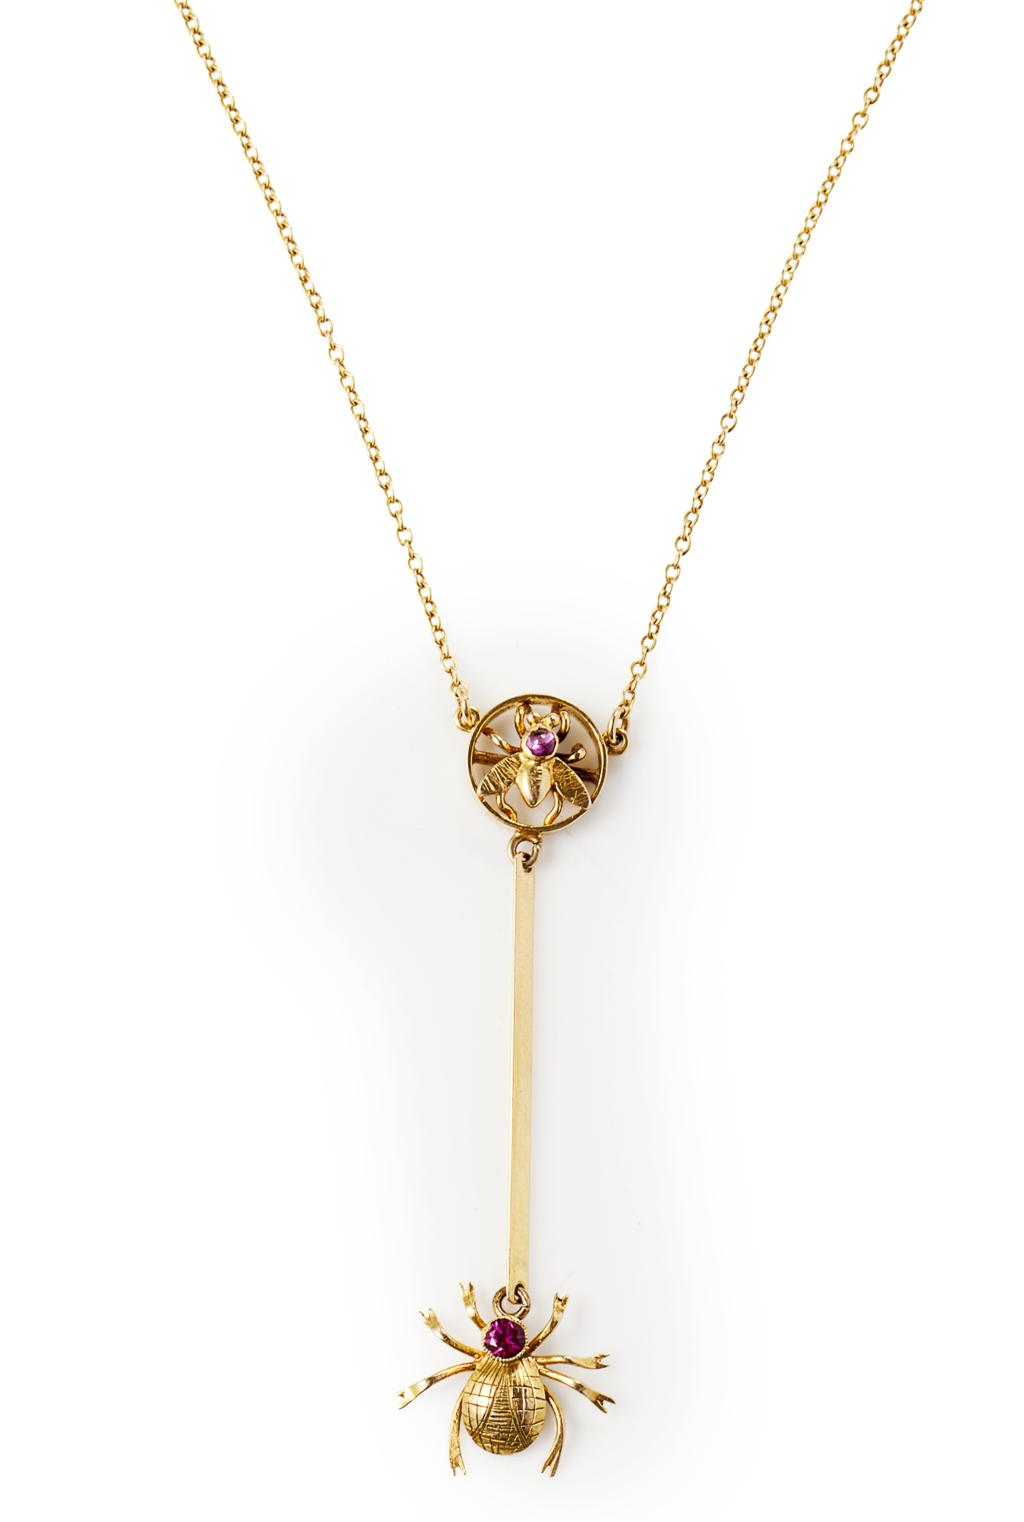 A gem set insect pendant Low estimate: £150 Lyon & Turnbull